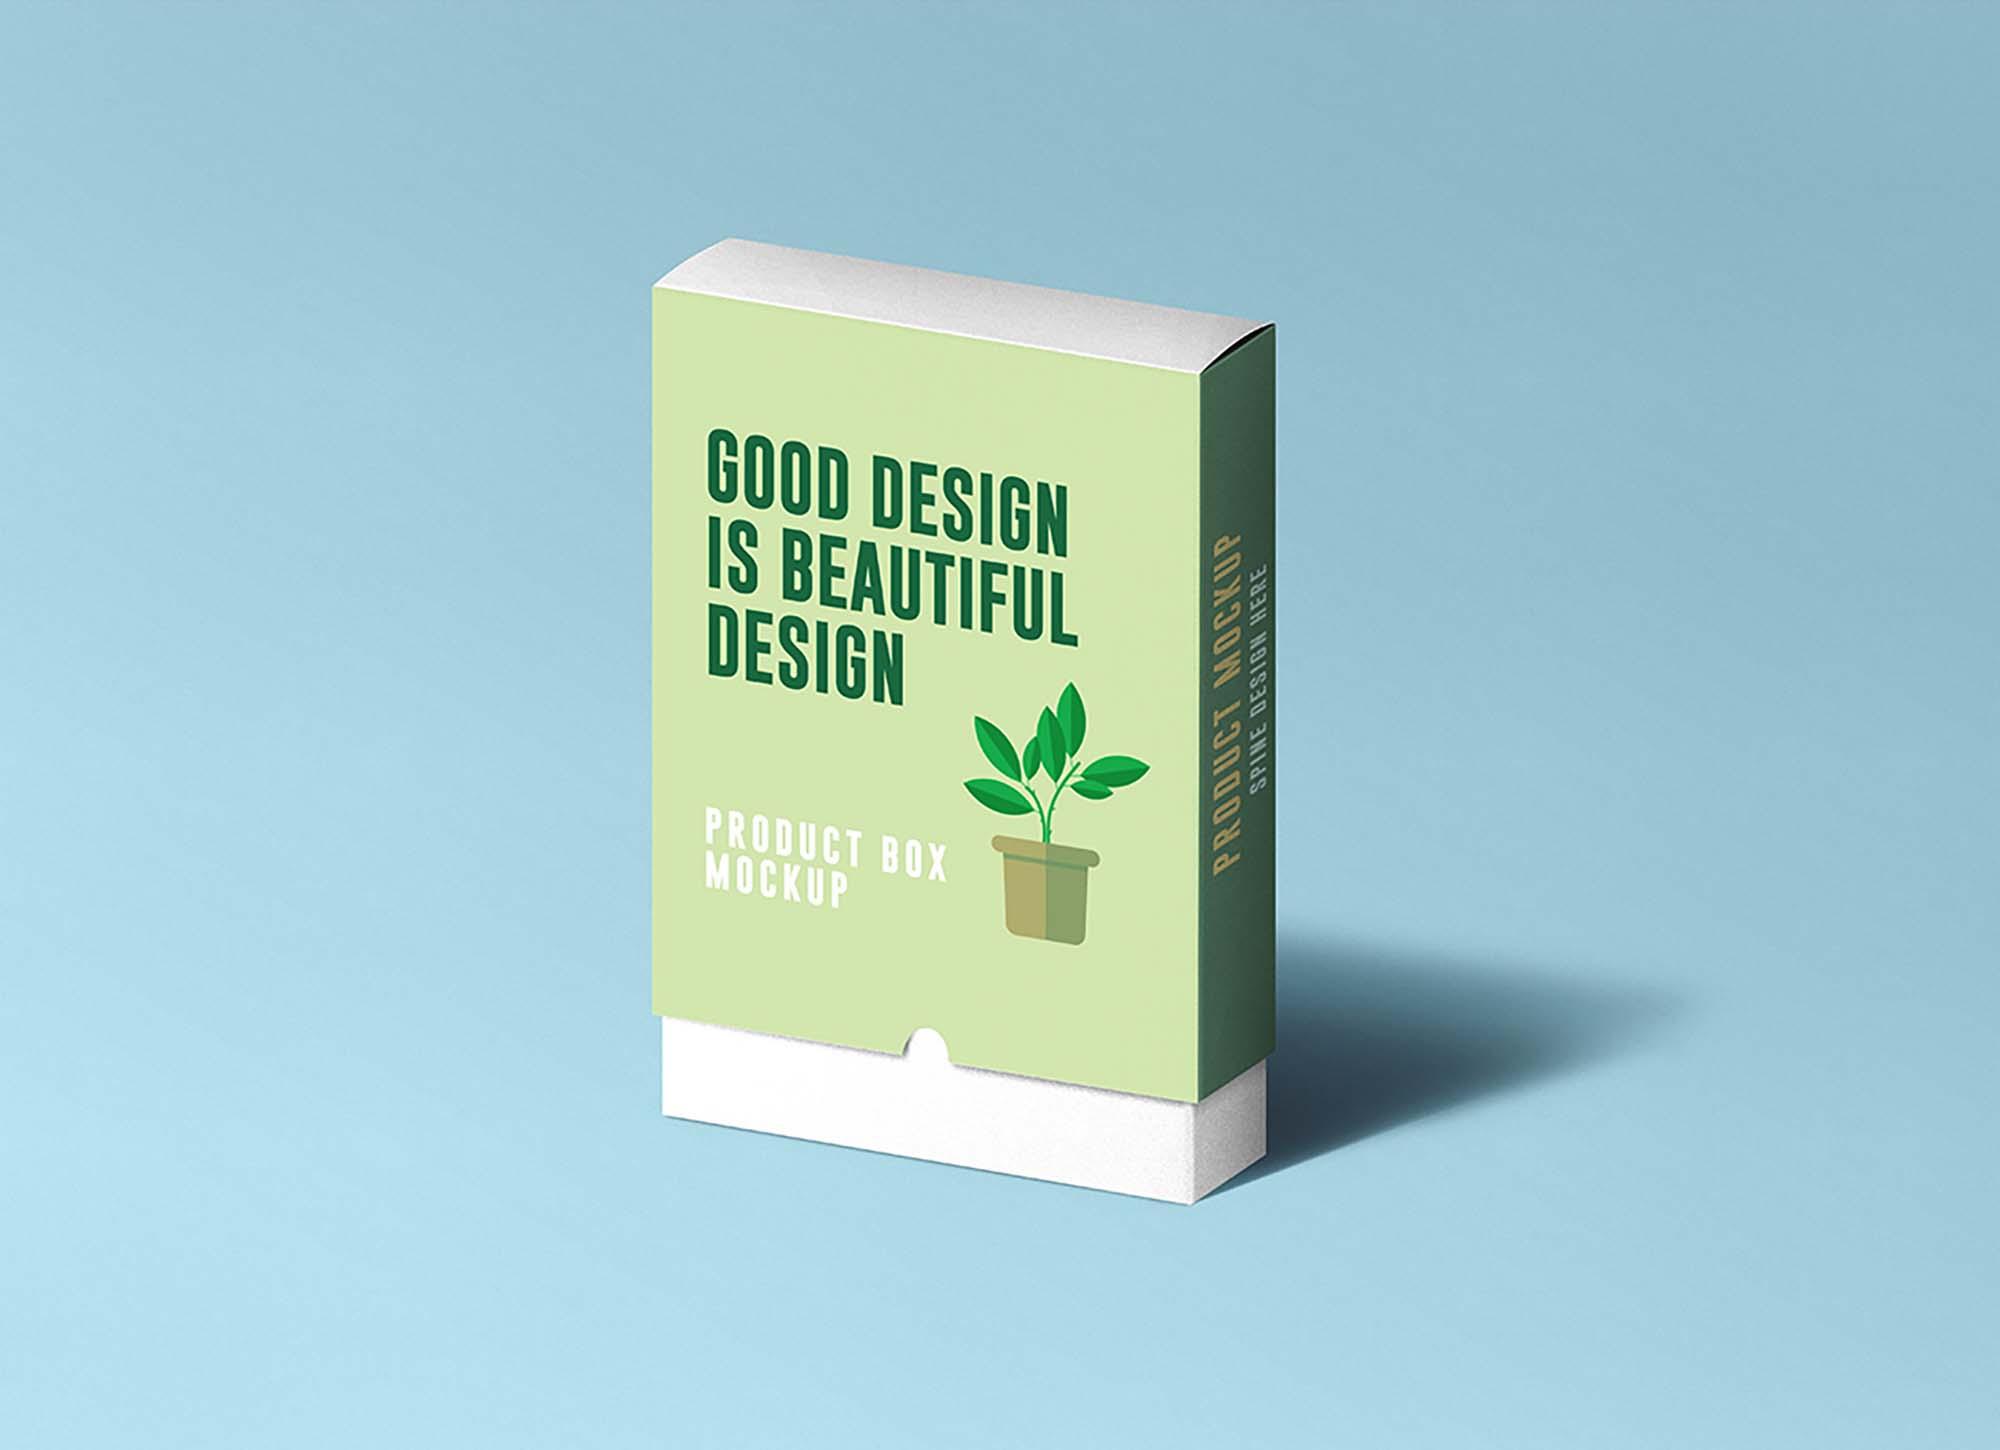 Slide Product Box Mockup 2